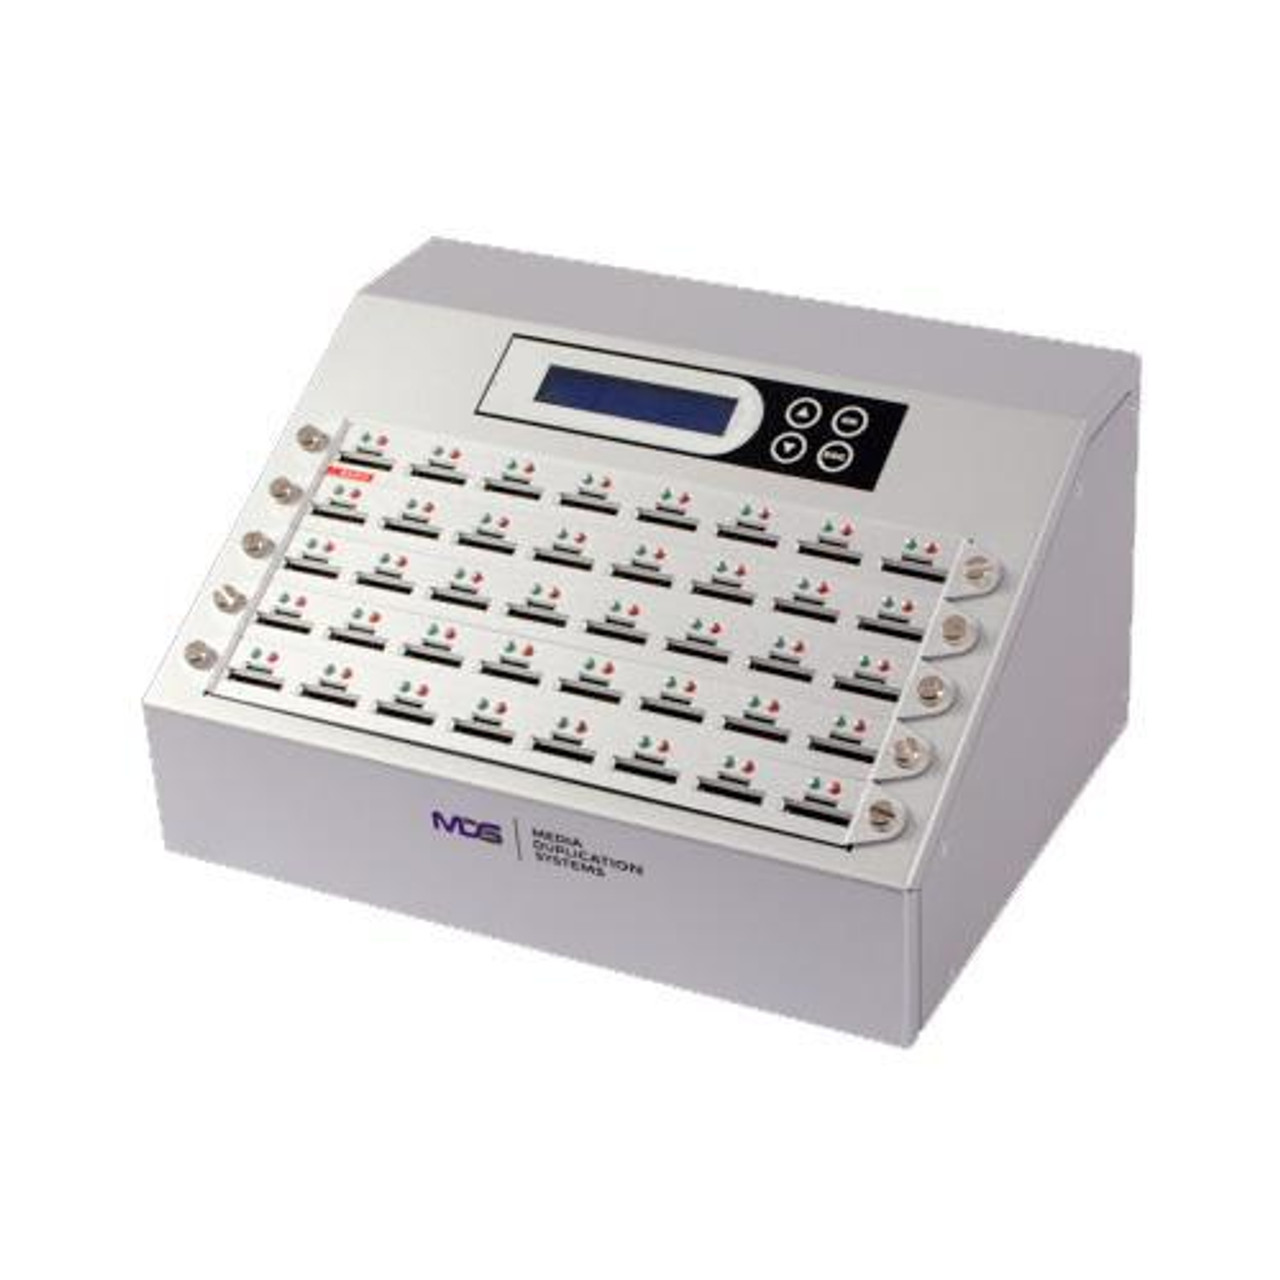 DupliSD 1 to 39 SD/microSD Flash Memory Duplicator, Cloning, Copier